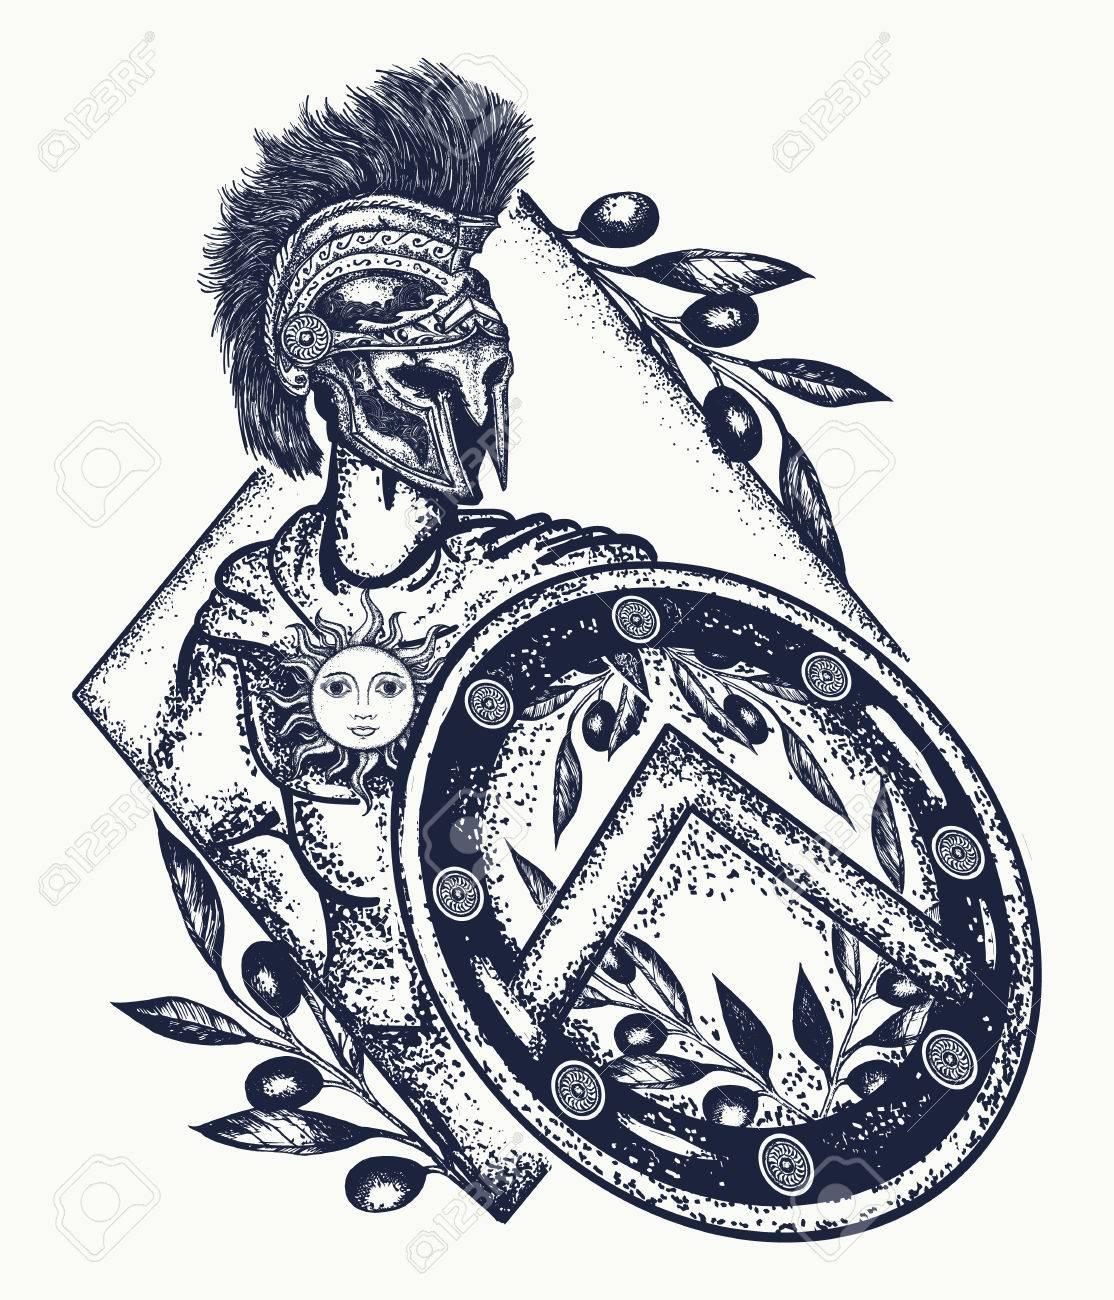 Tattoo kämpfer symbol